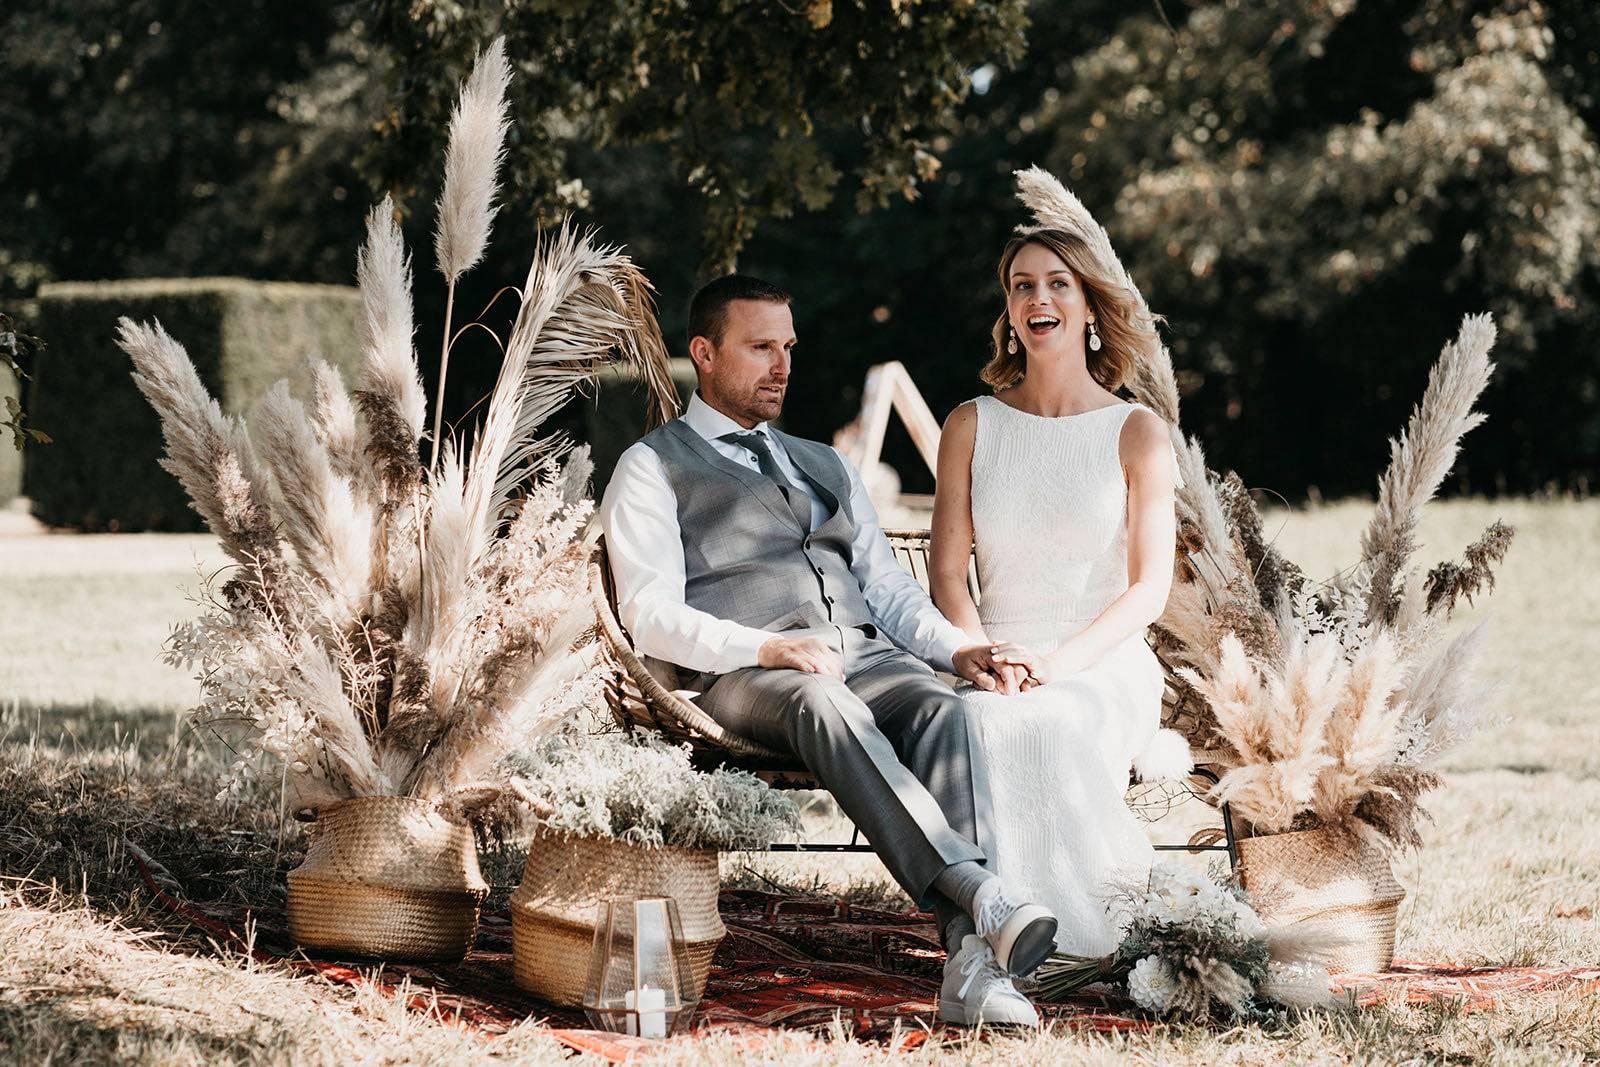 Ginger & Ginder - Ticia _ Tom - ceremonie (c) Melissa Milis - House of Weddings